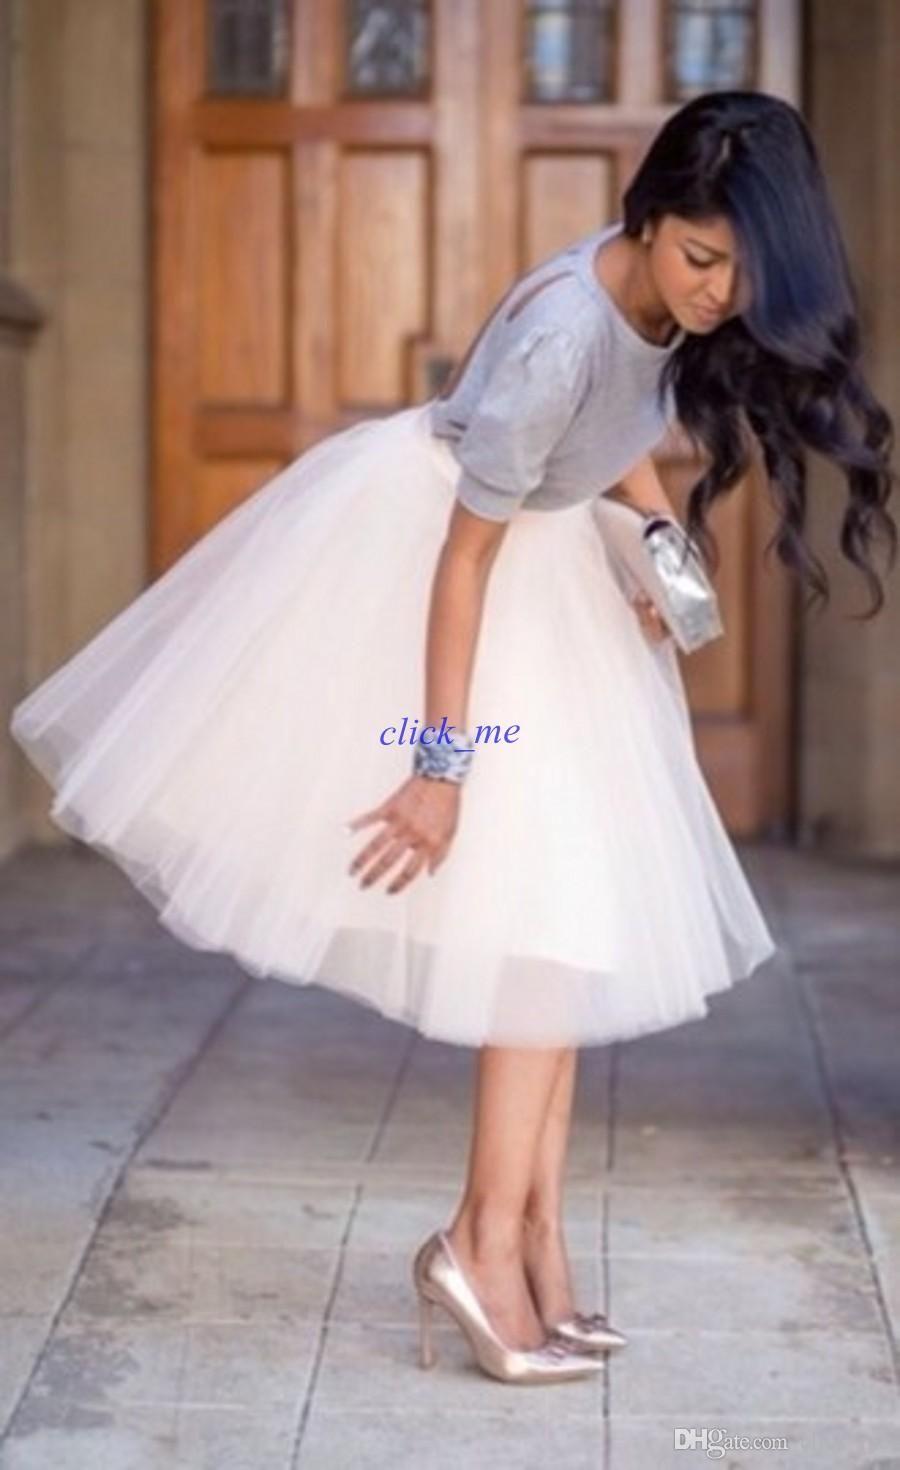 Tulle Knee Length Women Dress Soft Gauze Cute Bouffant Skirt For Wedding Party Hot Princess Cheap Bust Skirts Australia 2021 From Click Me Au Au 27 38 Dhgat Rehearsal Dinner Dresses White [ 1470 x 900 Pixel ]